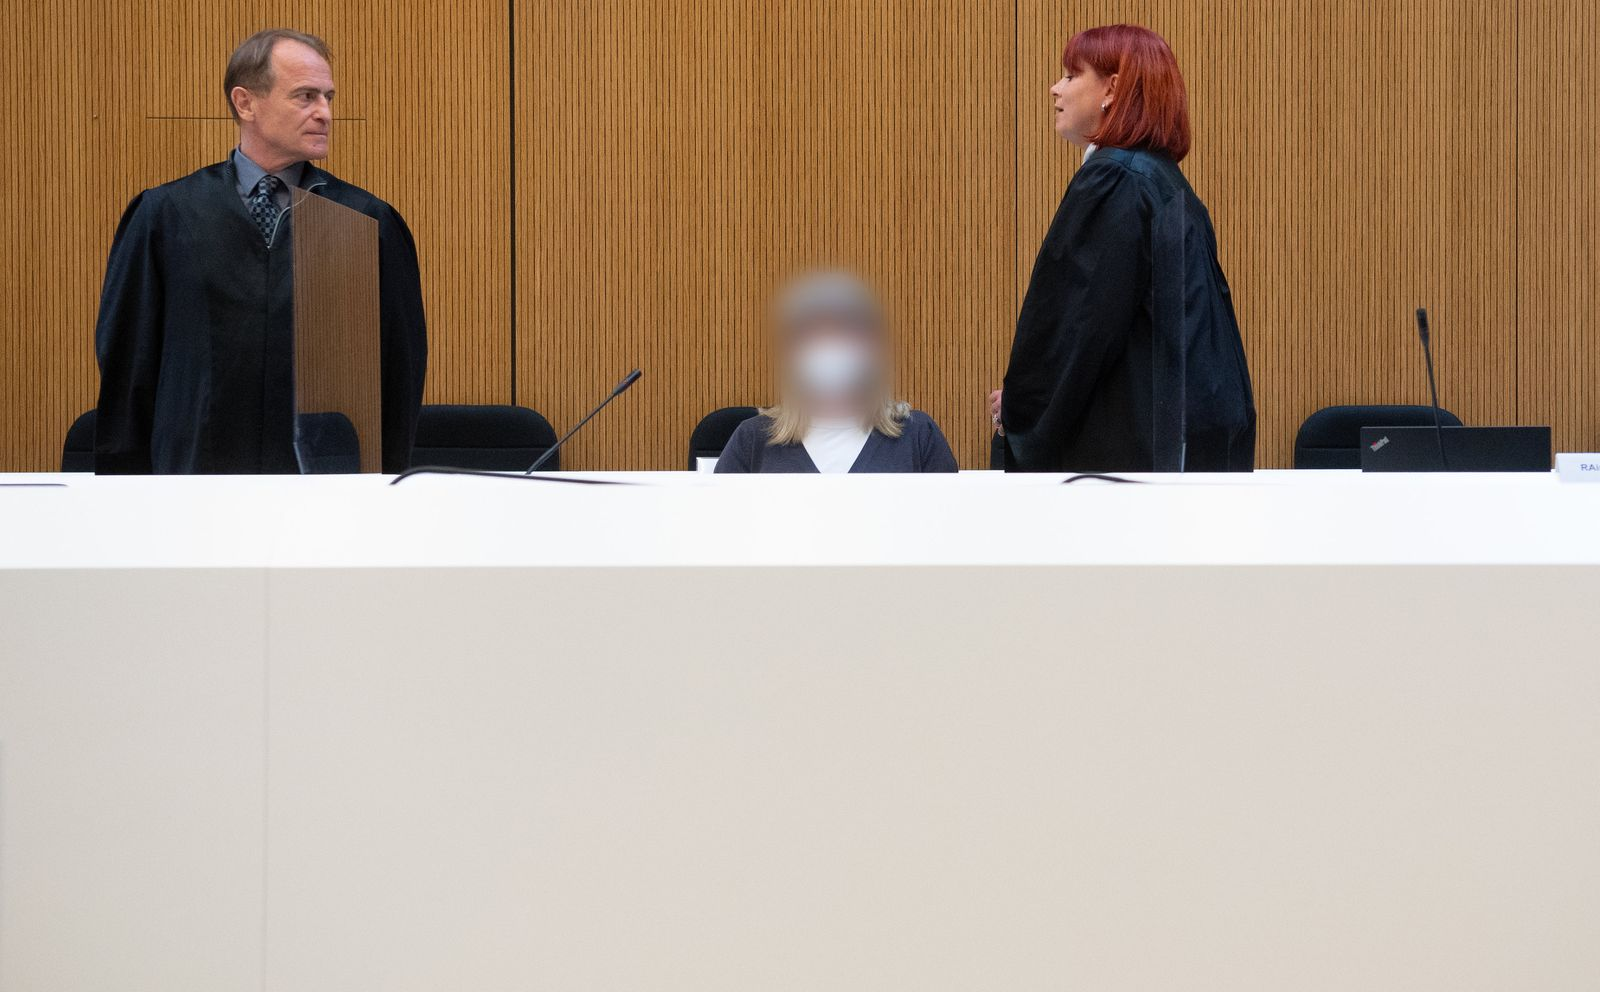 Prozess gegen mutmaßliche rechte Terroristin